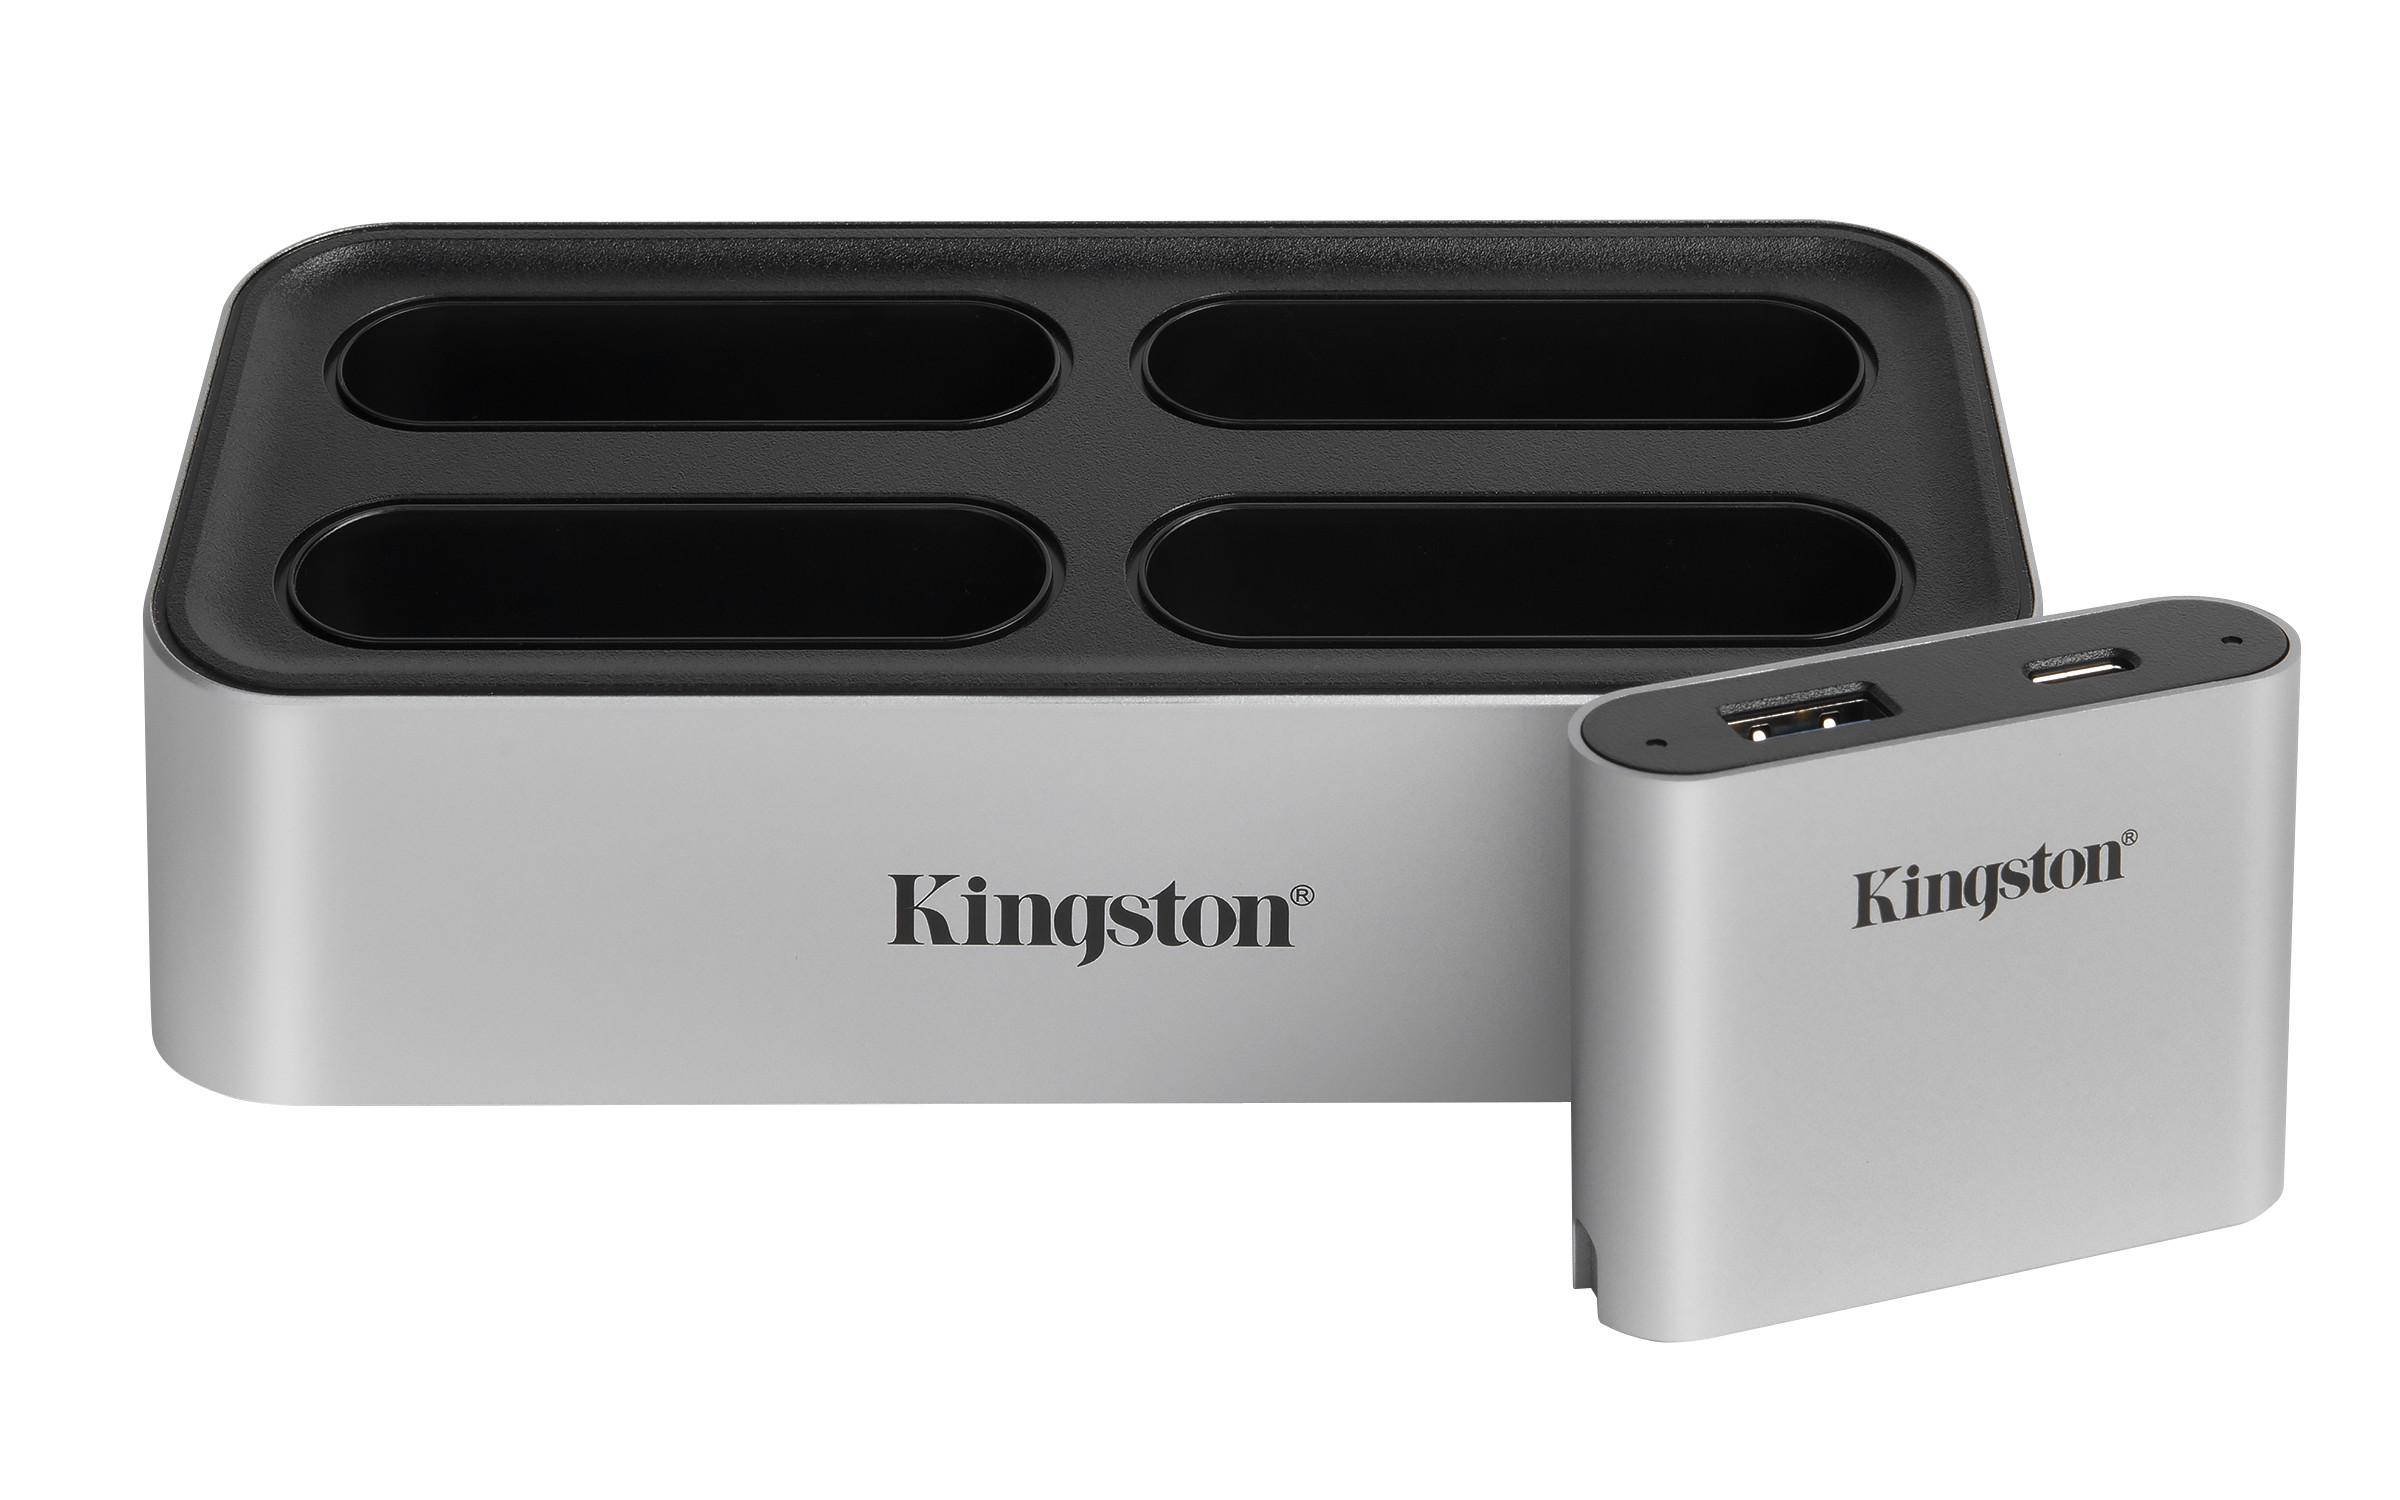 CES 2021: Kingston Digital — nowe produkty z serii Workflow